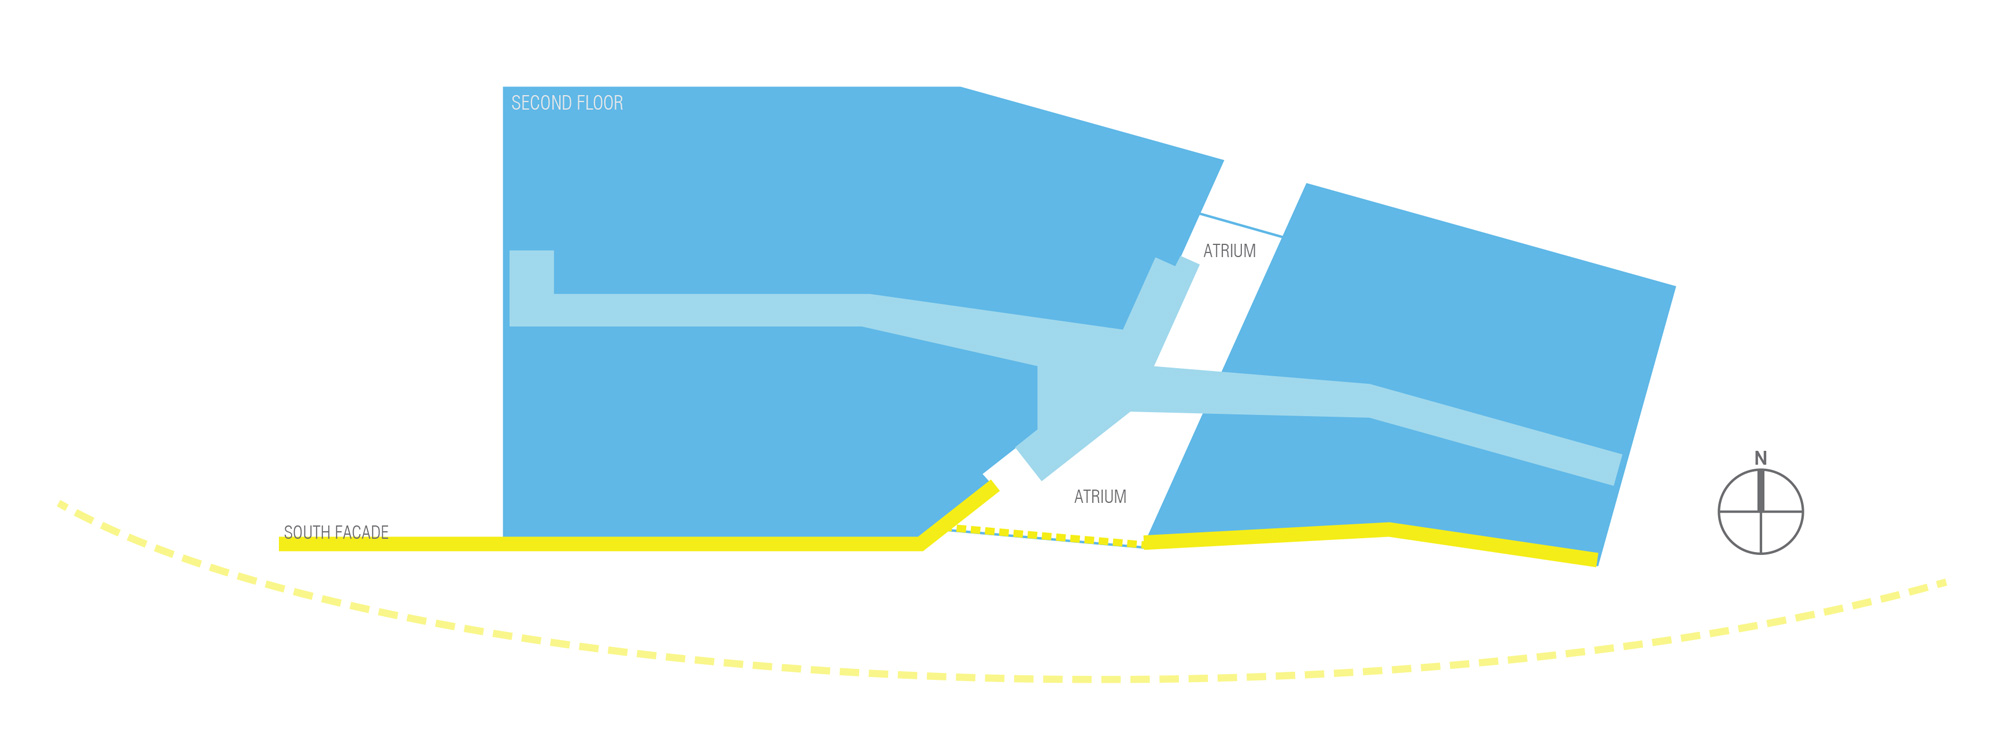 Diagramma Sud © Shinberg.Levinas Architects